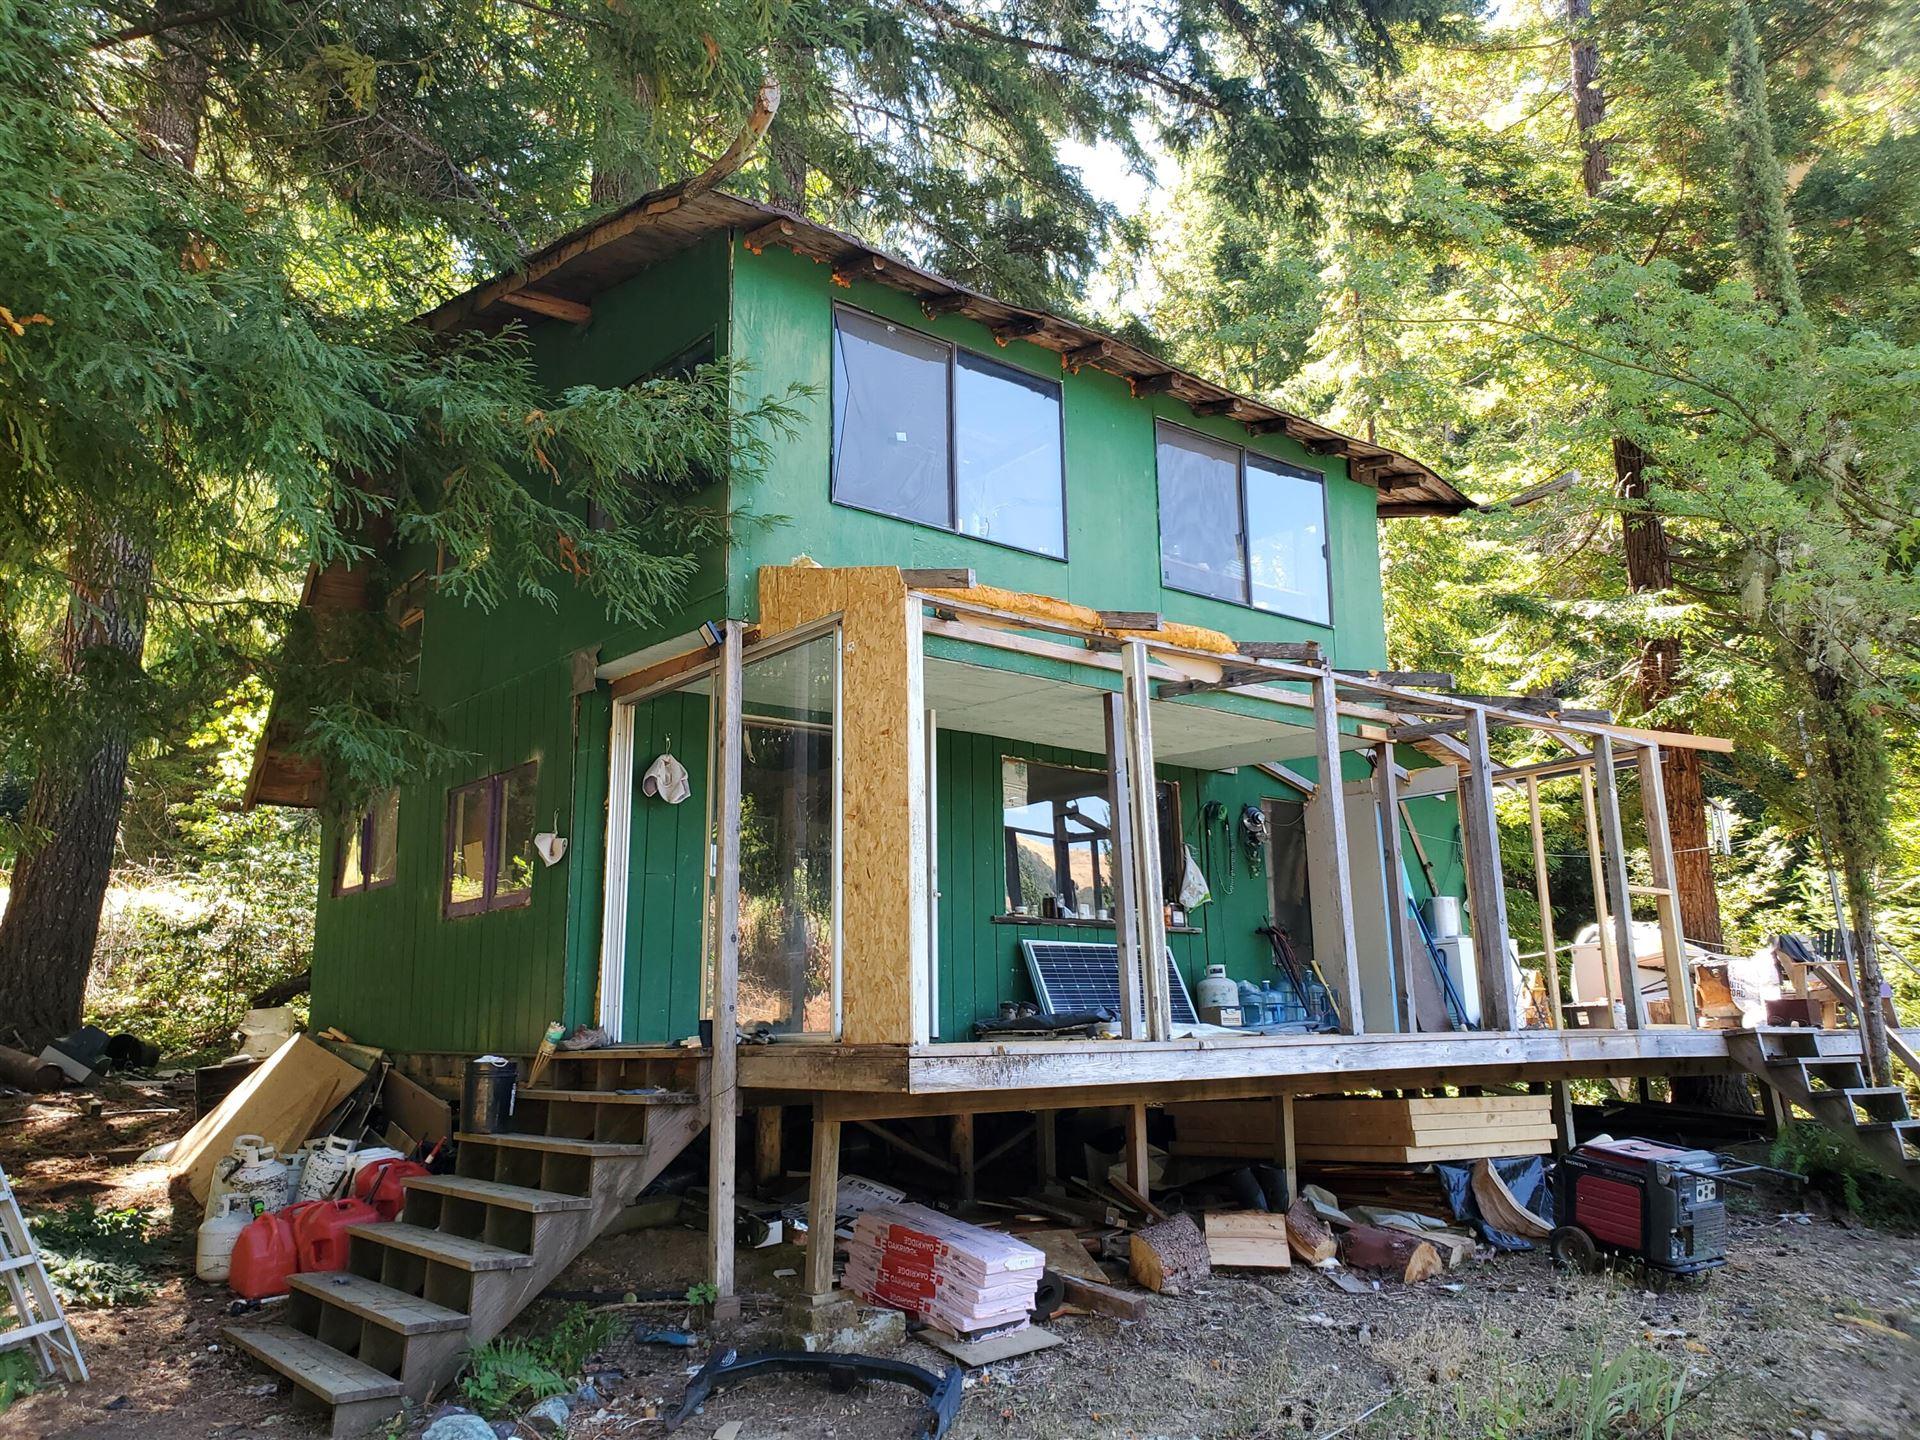 4700 &5190 Rancho Sequoia Drive, Alderpoint, CA 95511 - MLS#: 260292